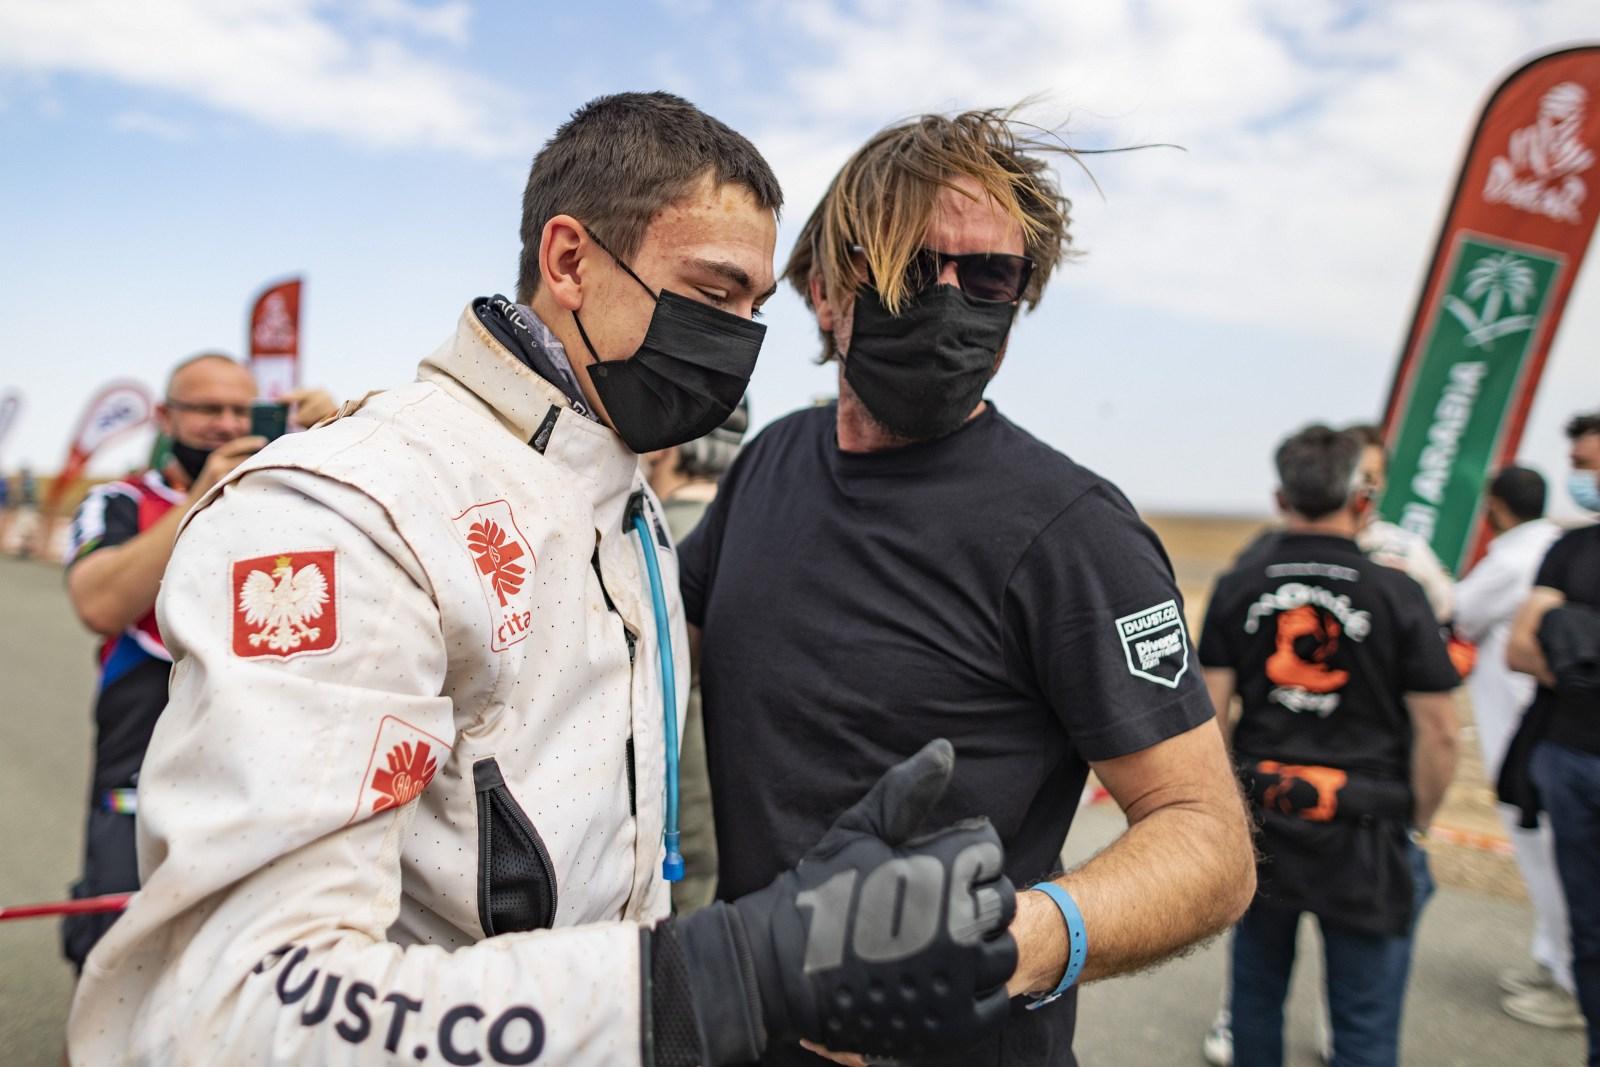 Konrad i Marek Dabrowski